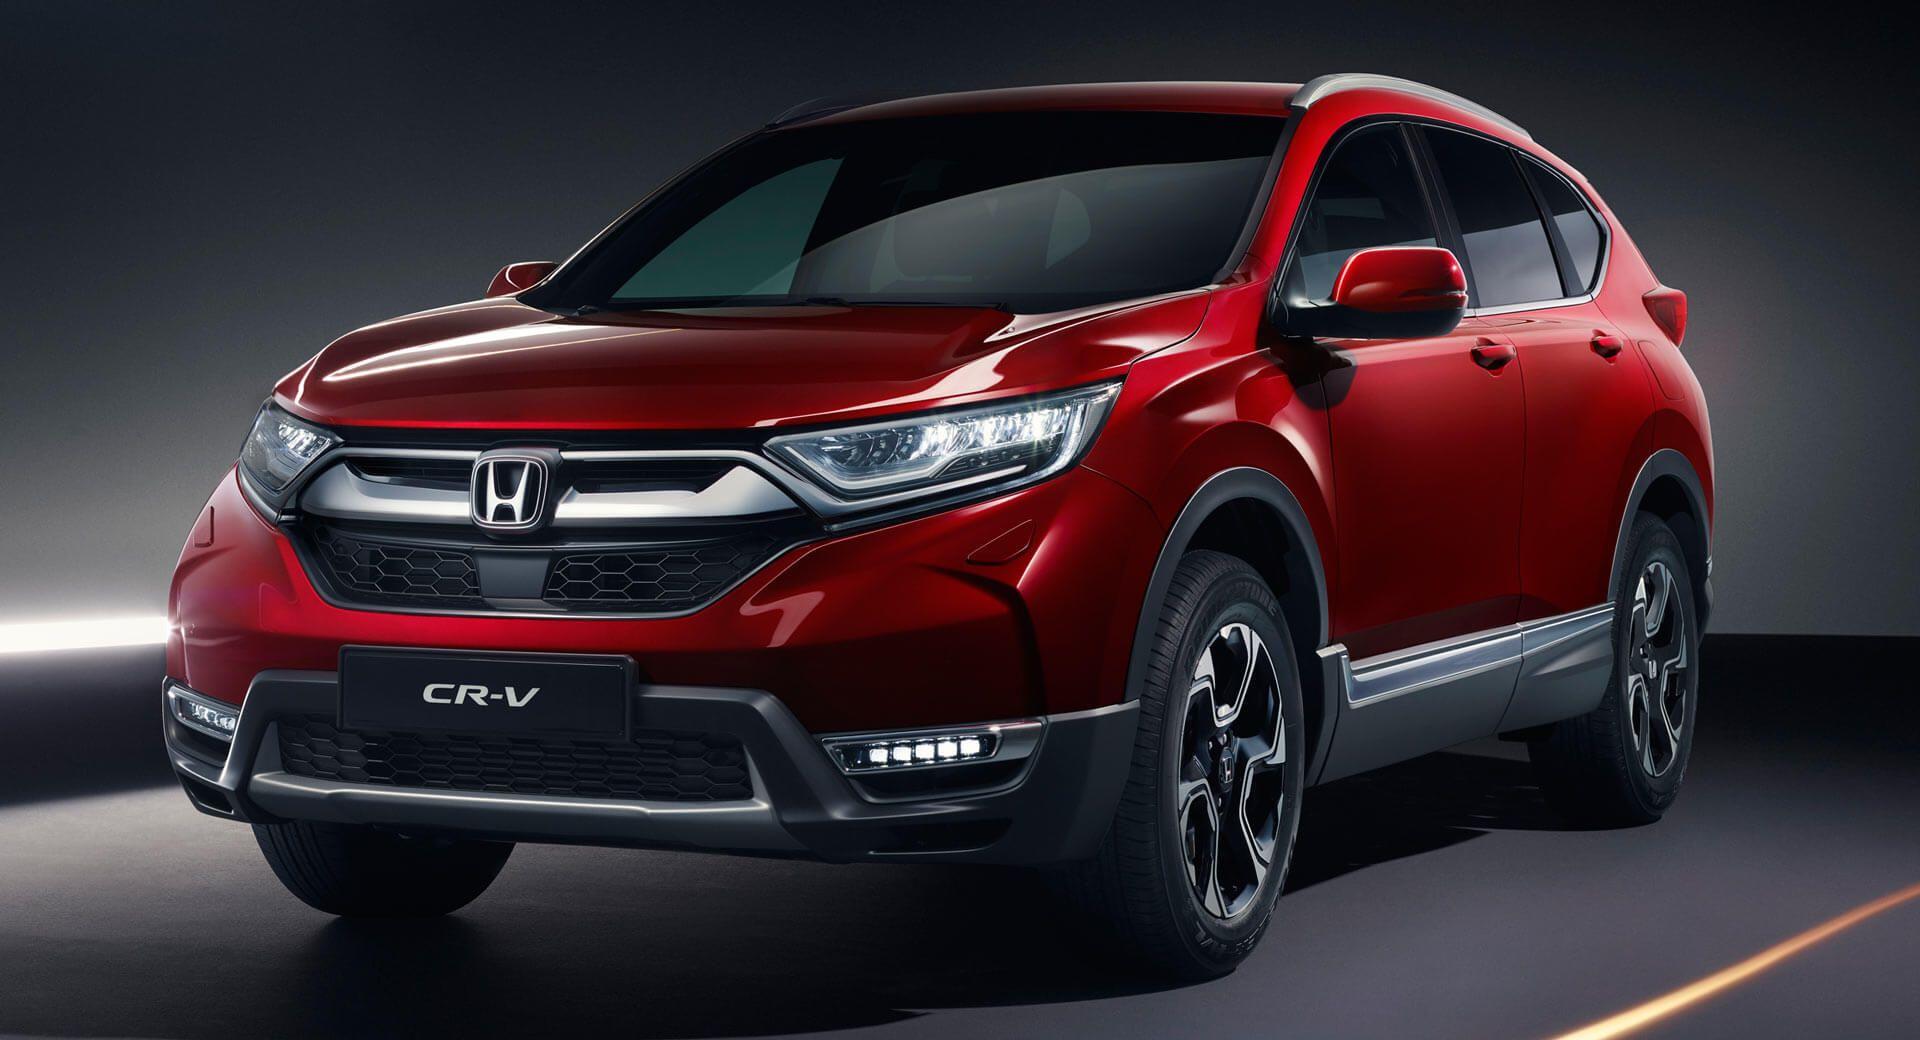 Euro Spec 2018 Honda Cr V Arrives With Hybrid And 7 Seat Options Carscoops Honda Cr Honda Crv Honda Hrv